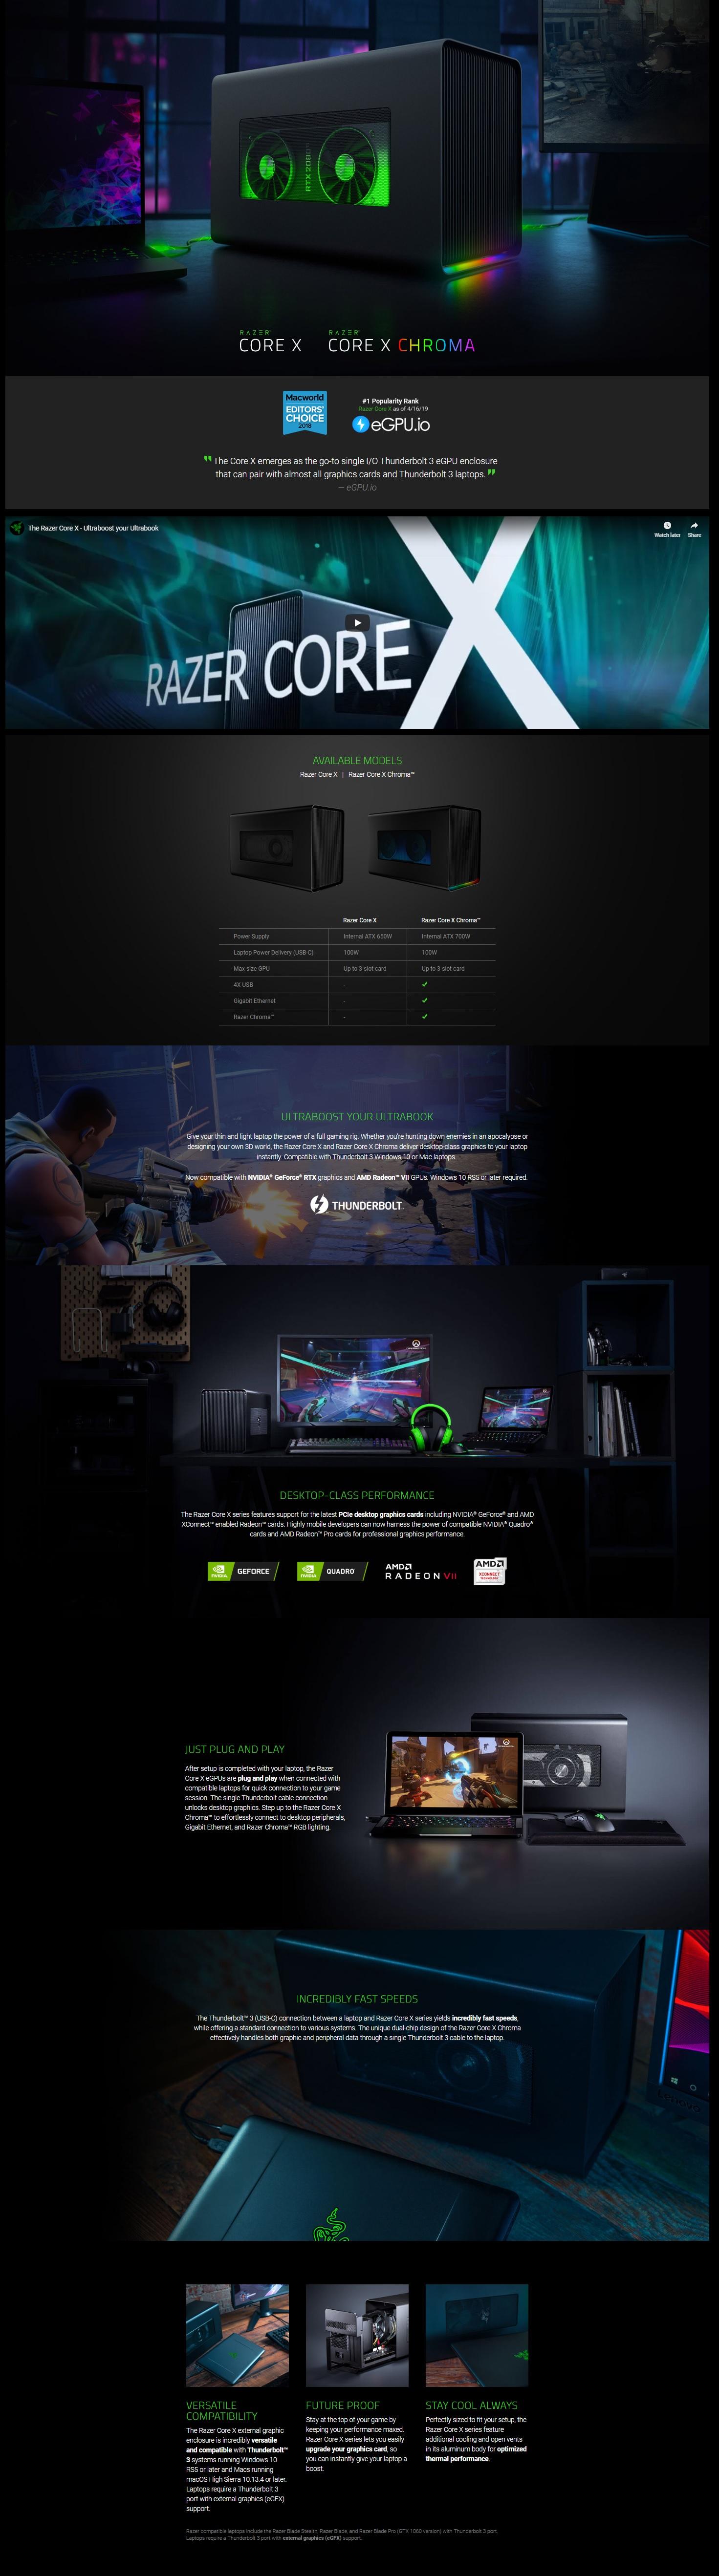 Razer Core X Chroma - Thunderbolt™ 3 eGPU (RC21-01430100-R3W1)